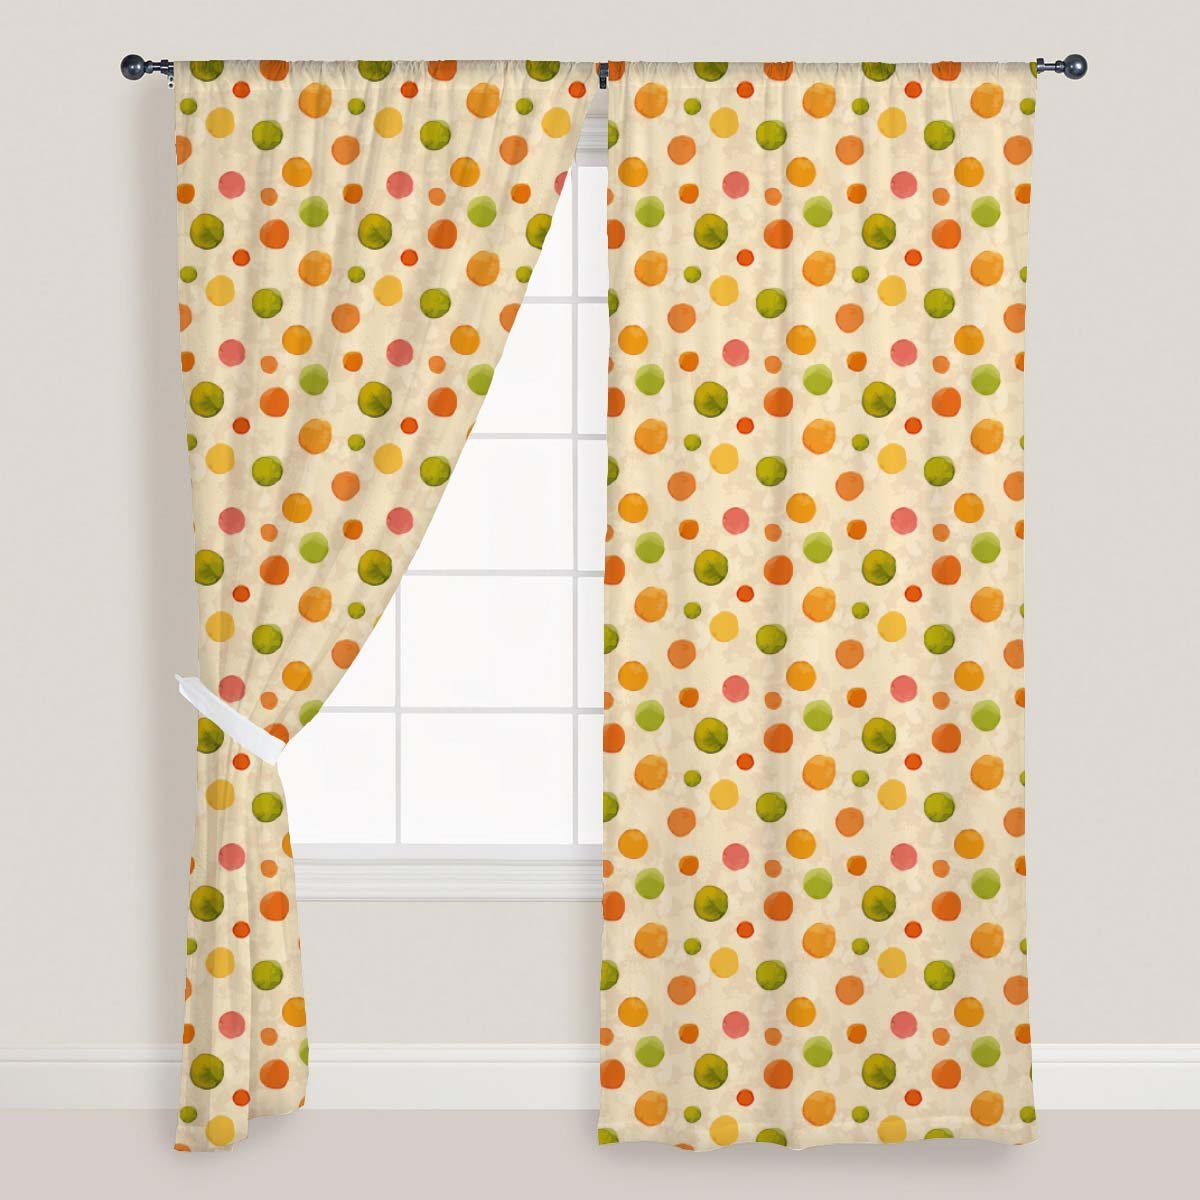 tienda en linea AZ Watercolor Dots 1 Door  Window Curtain Satin 4feet 4feet 4feet x 6feet; Set of 2 PCS  barato